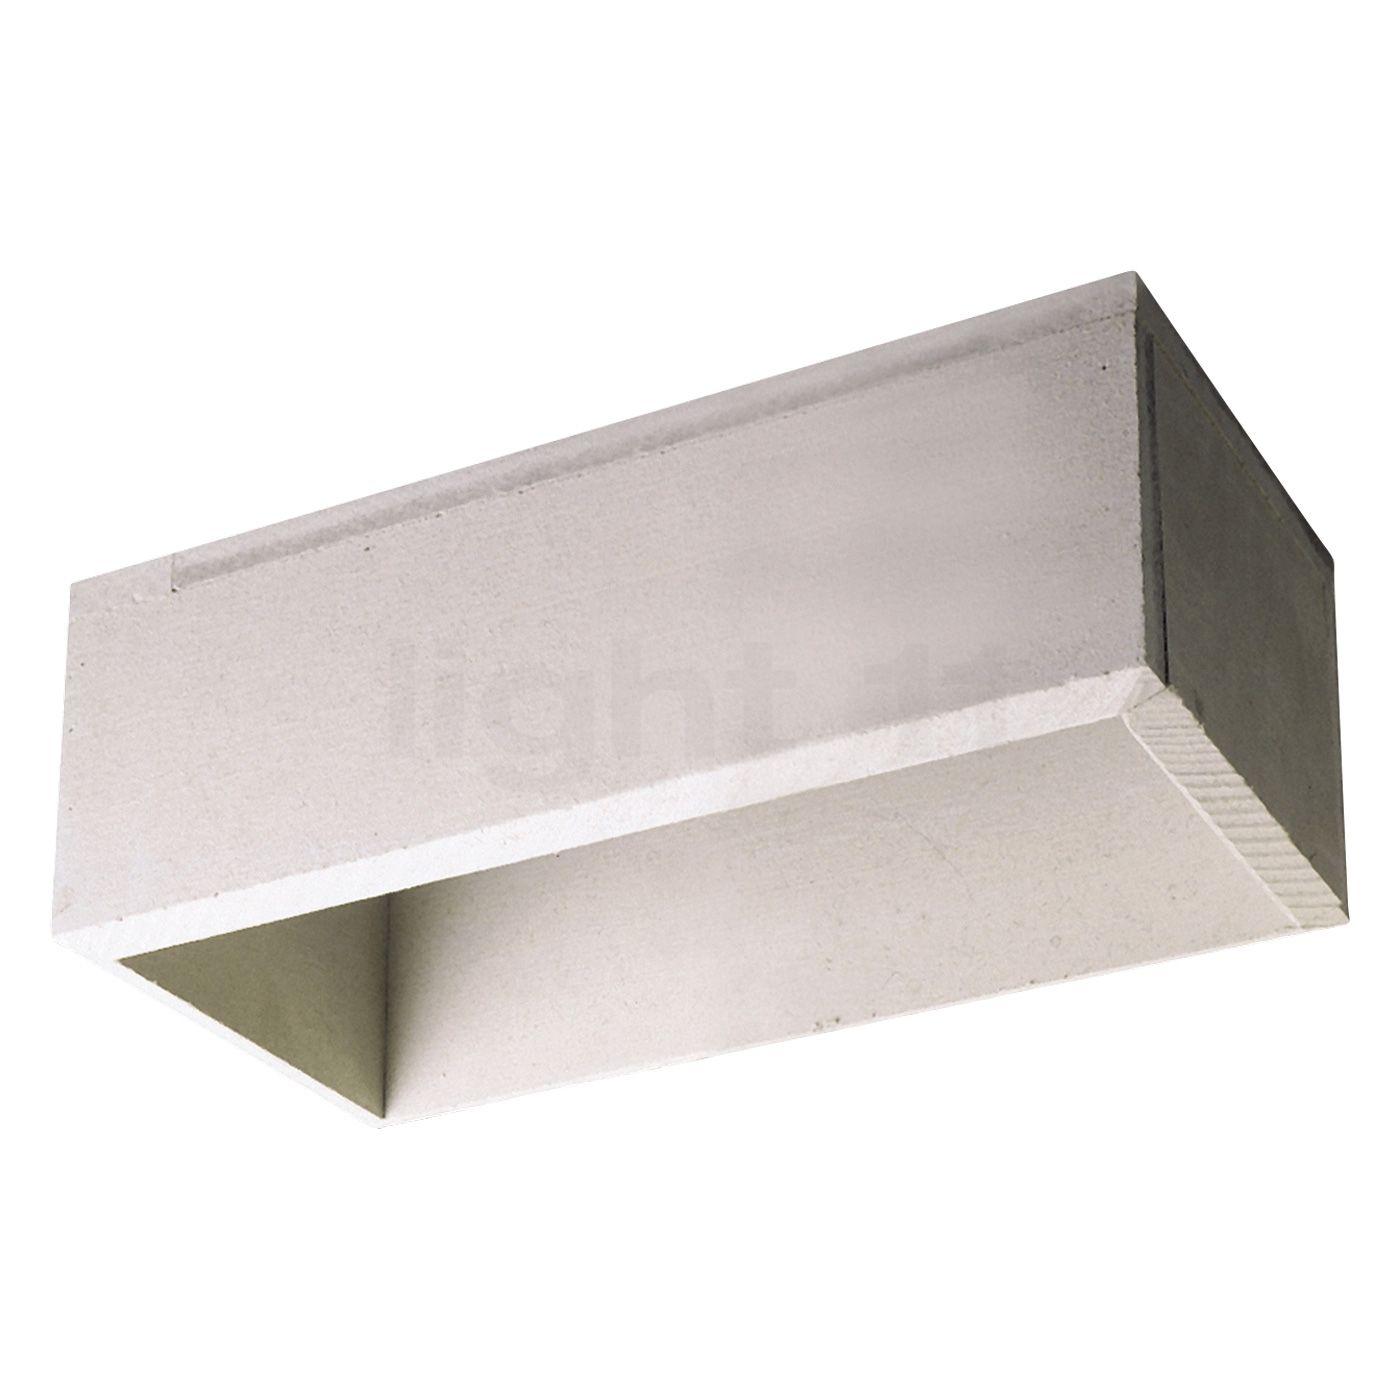 delta light minigrid in zb 2 box l buy at. Black Bedroom Furniture Sets. Home Design Ideas